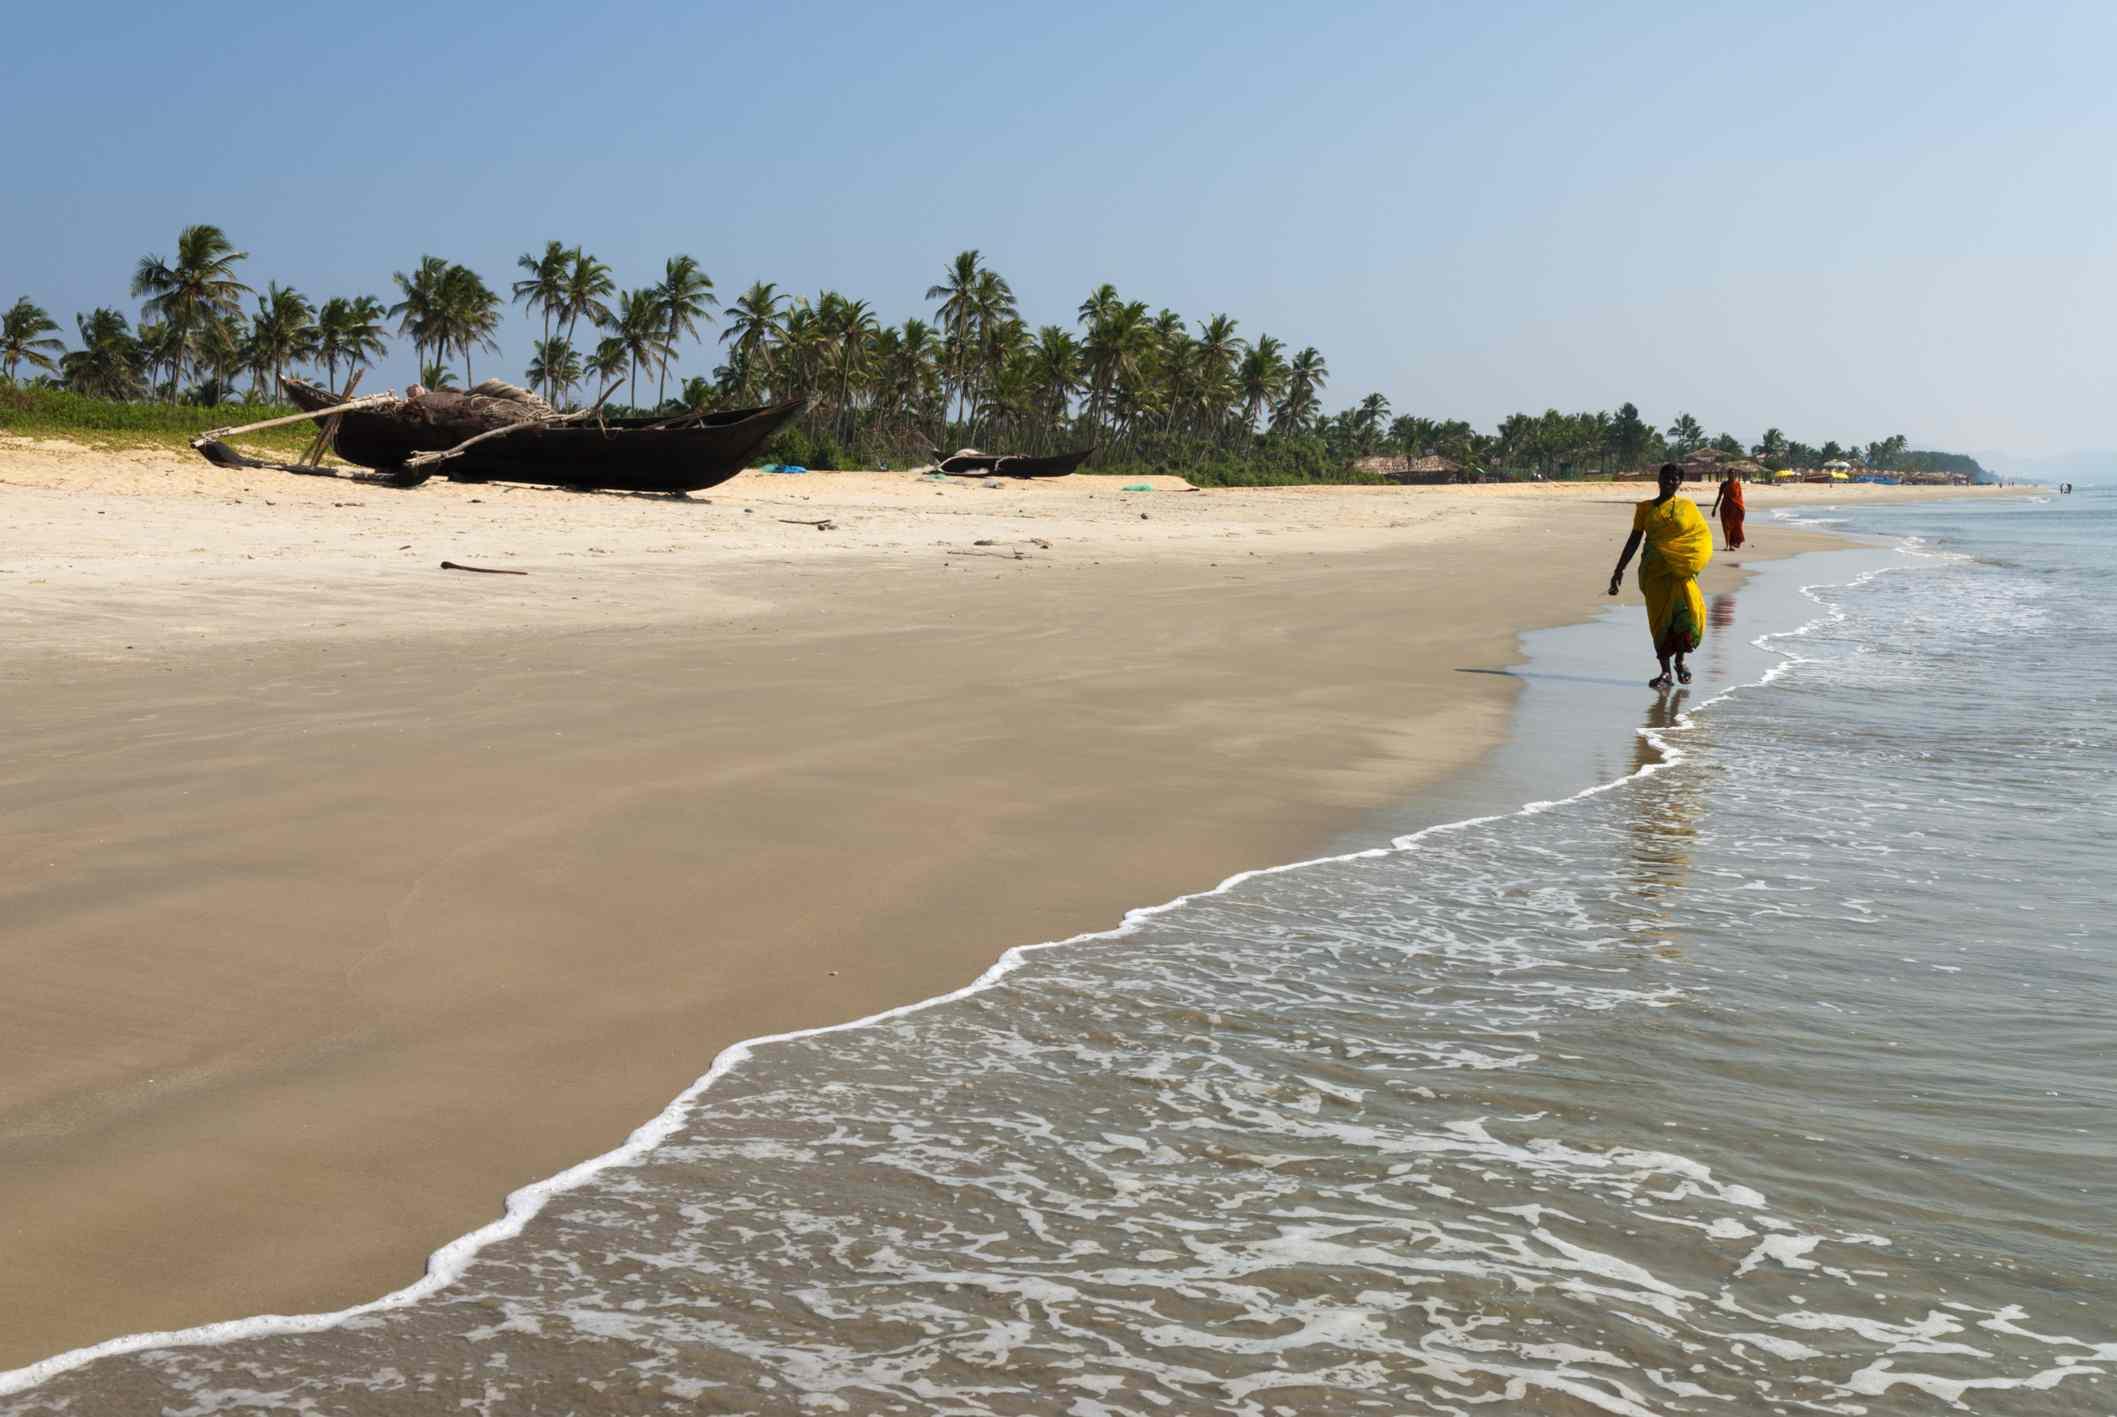 Vista a lo largo de la playa, Benaulim, Goa, India, Asia